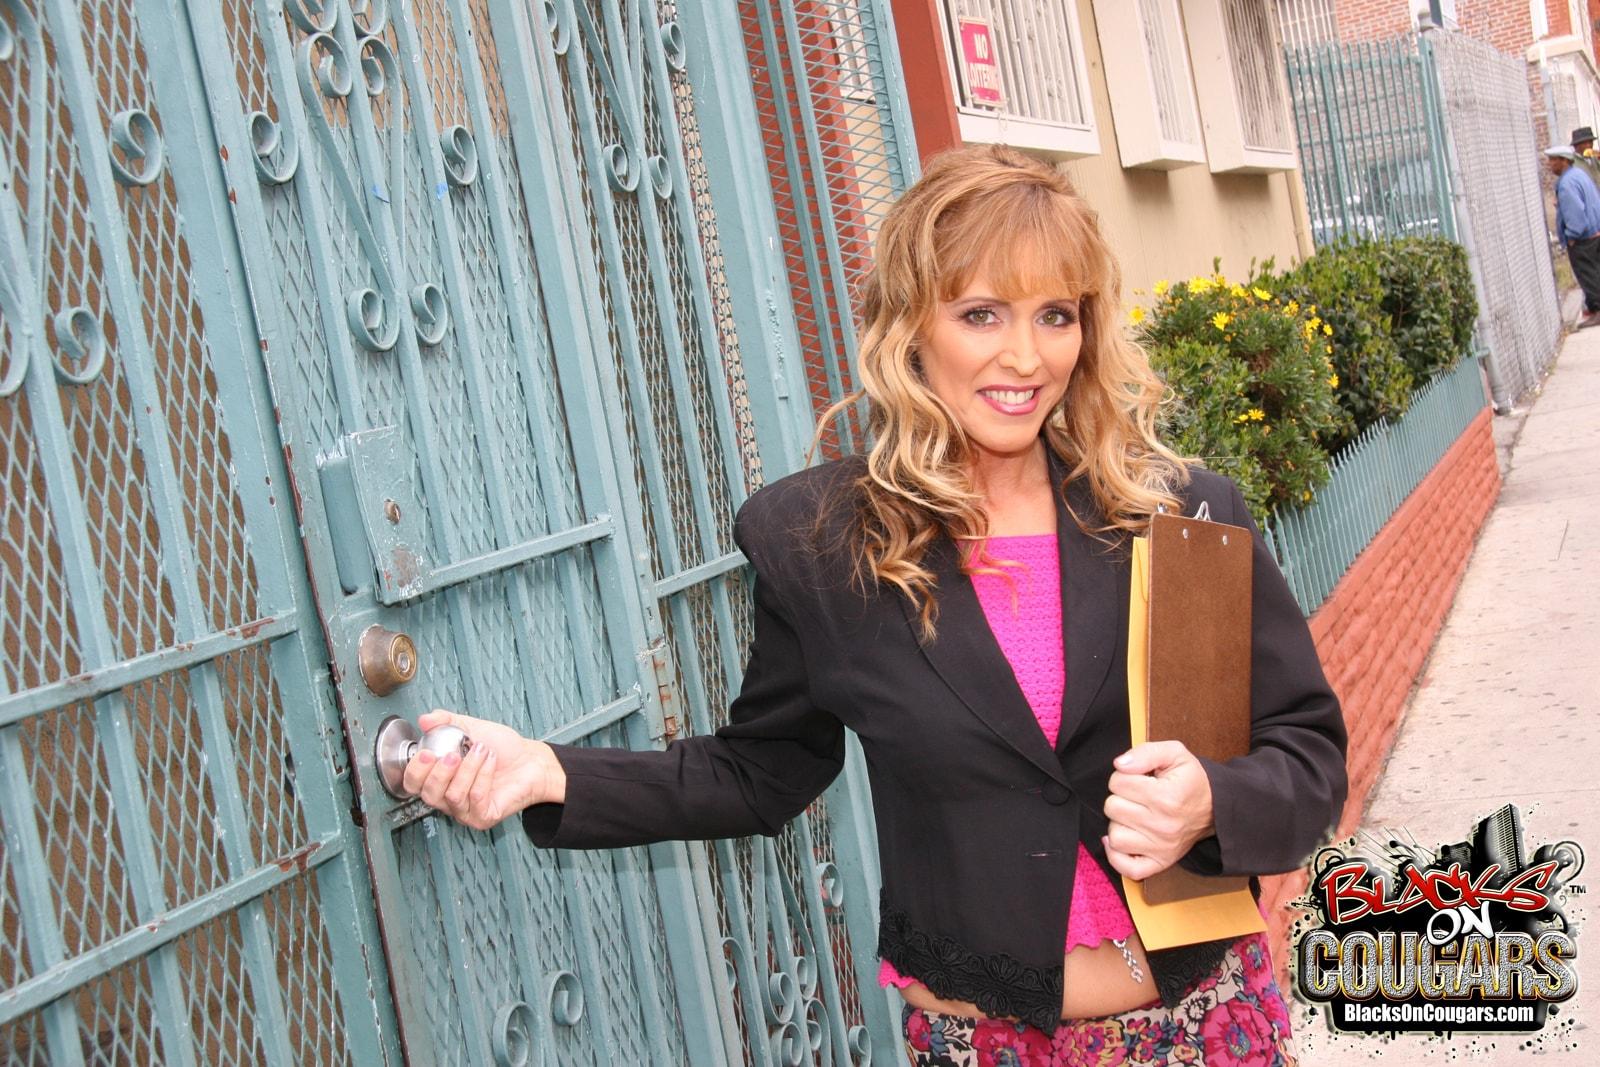 Dogfart '- Blacks On Cougars' starring Nicole Moore (Photo 1)